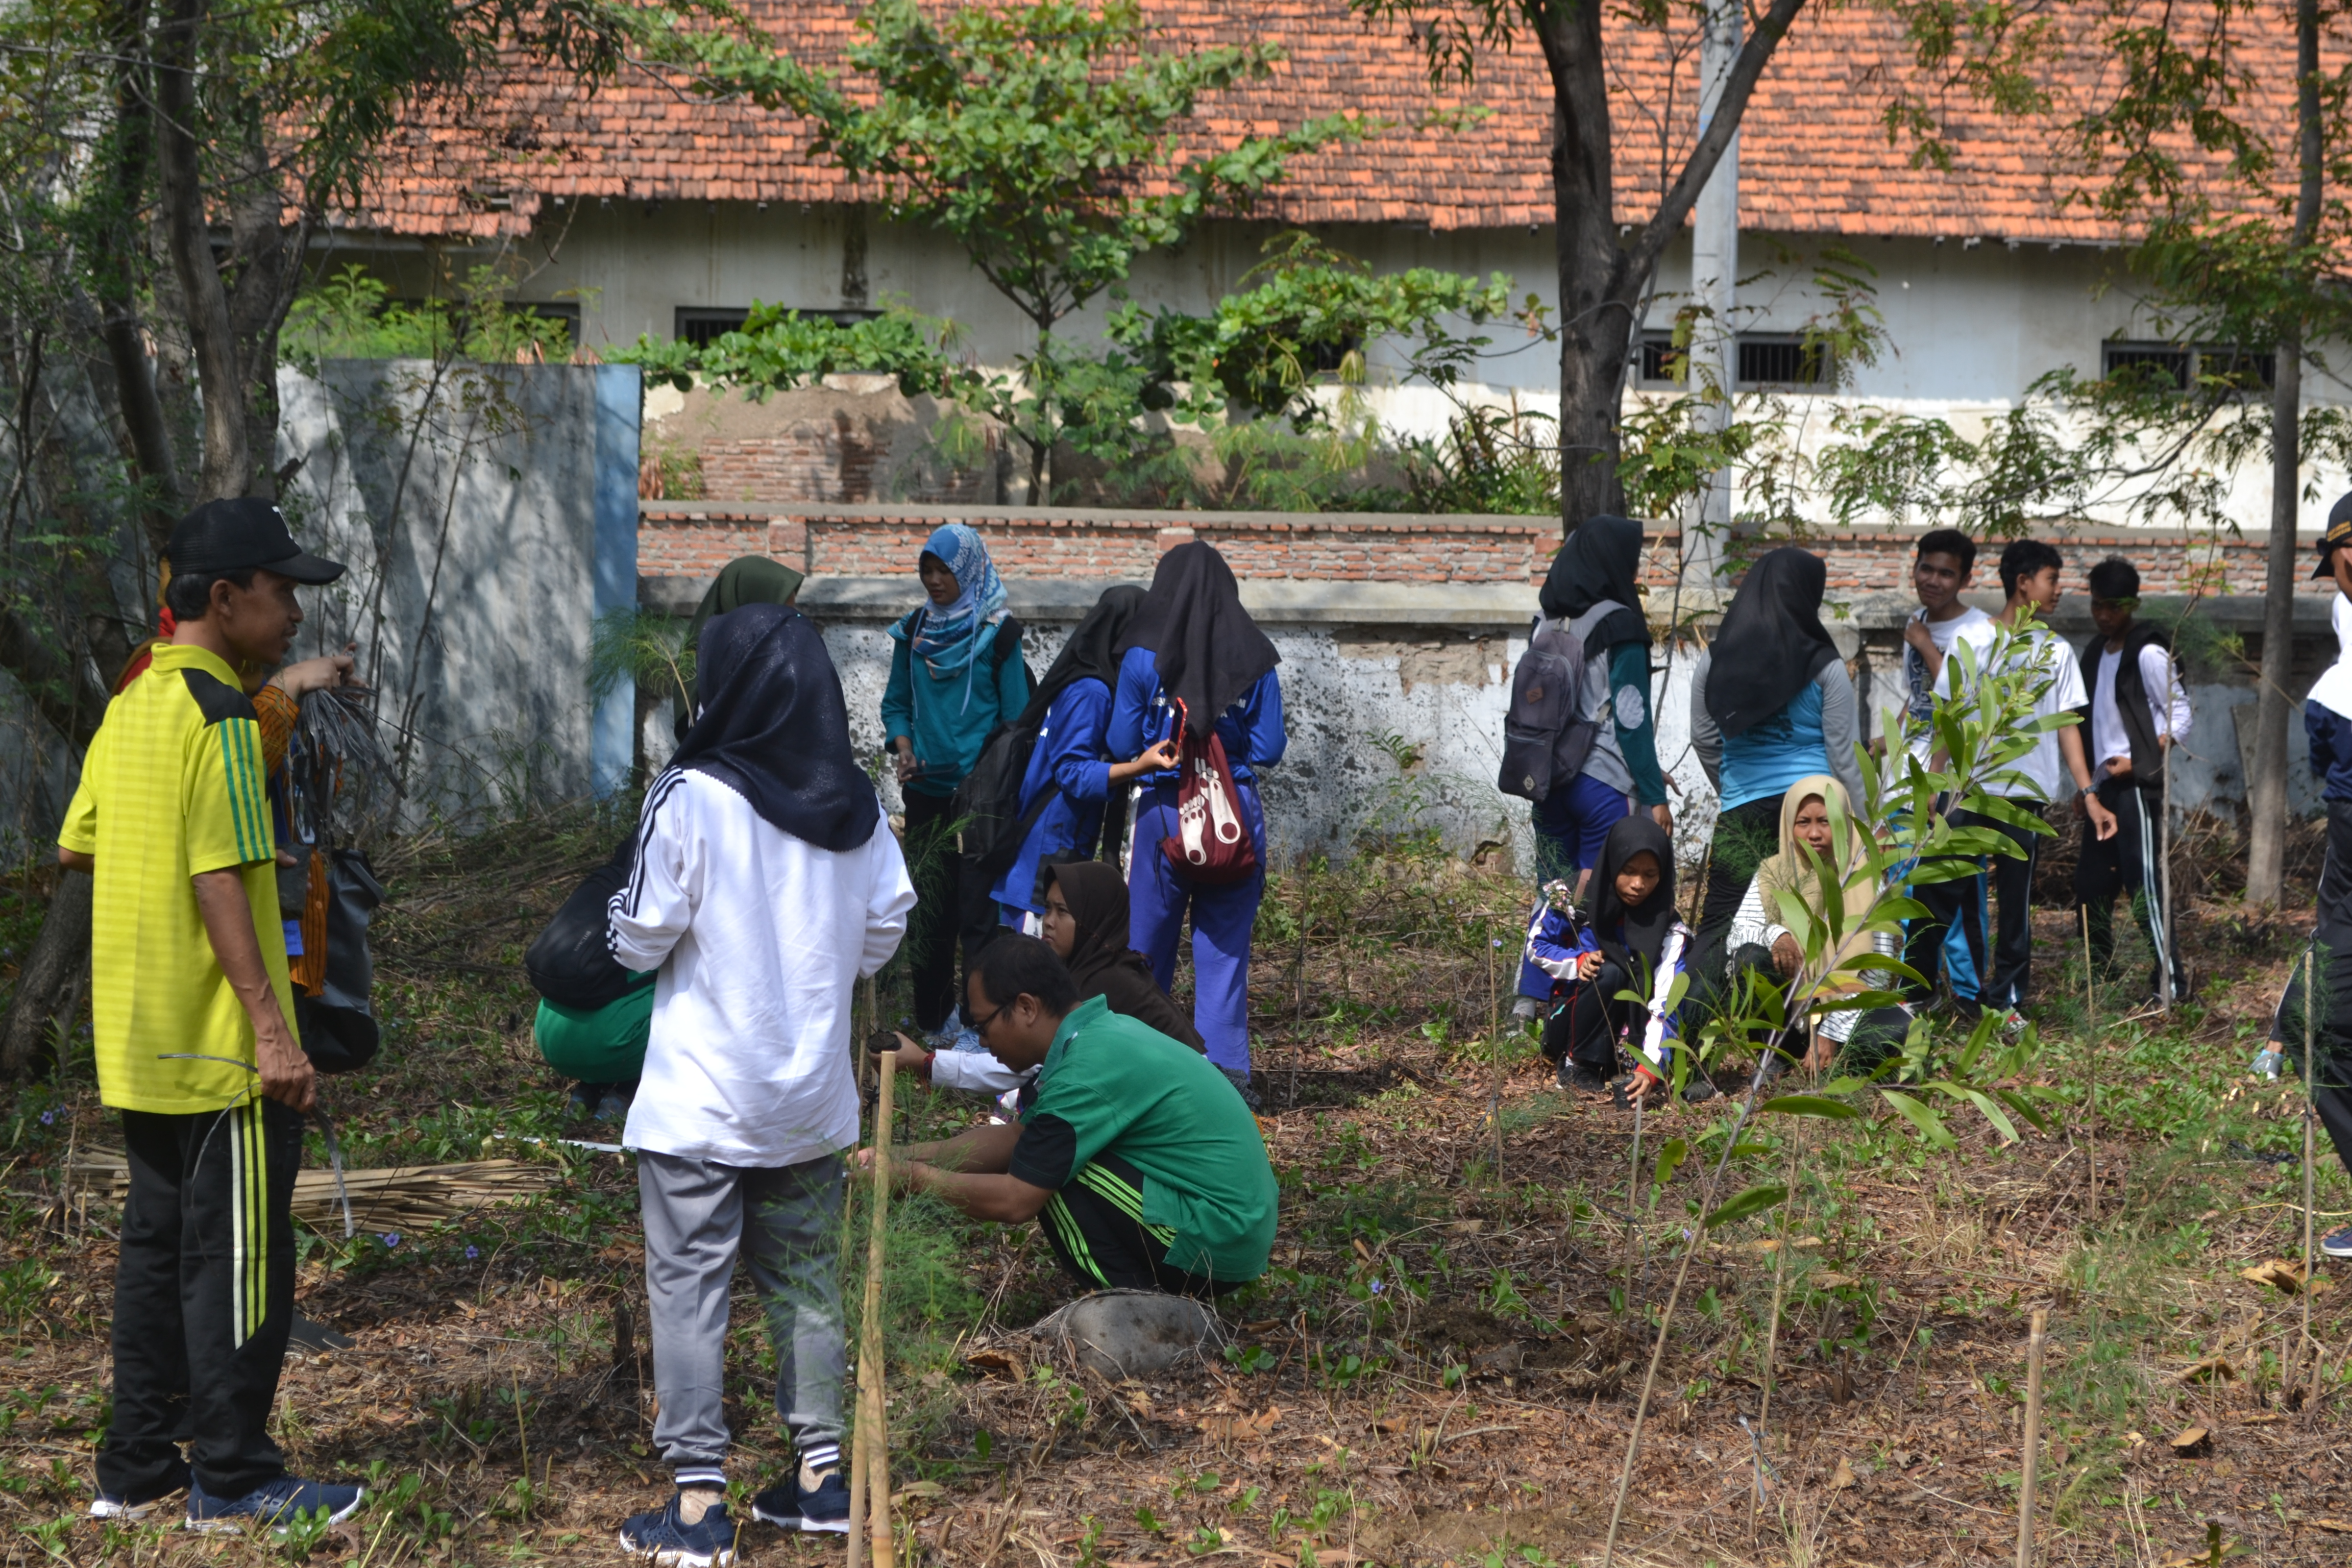 peserta sedang melakukan penanaman di kawasan Pantai Alam Indah,Kota Tegal